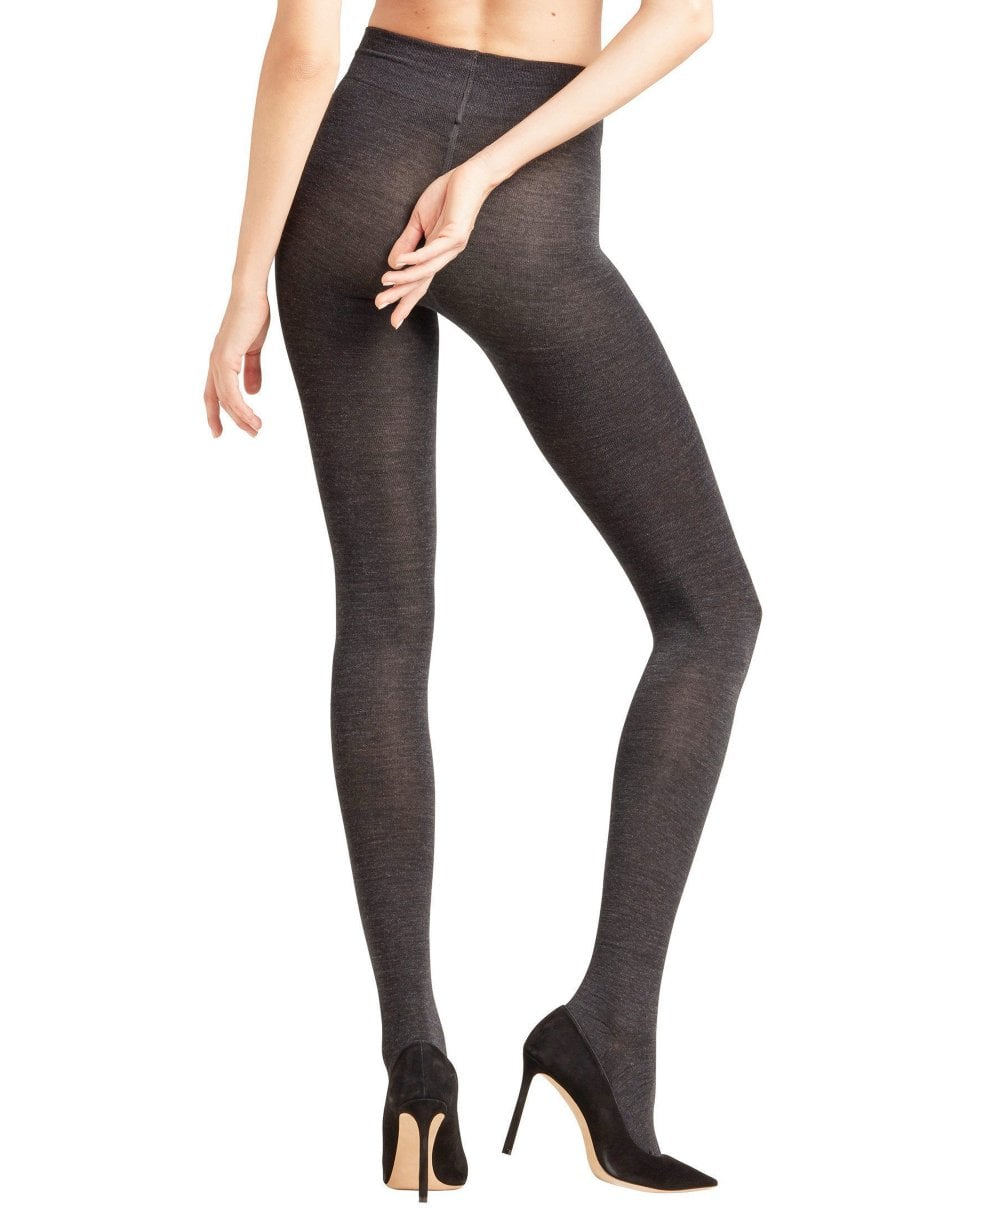 b2720a492b928 Falke Soft Merino Wool Tights - Tights from luxury-legs.com UK